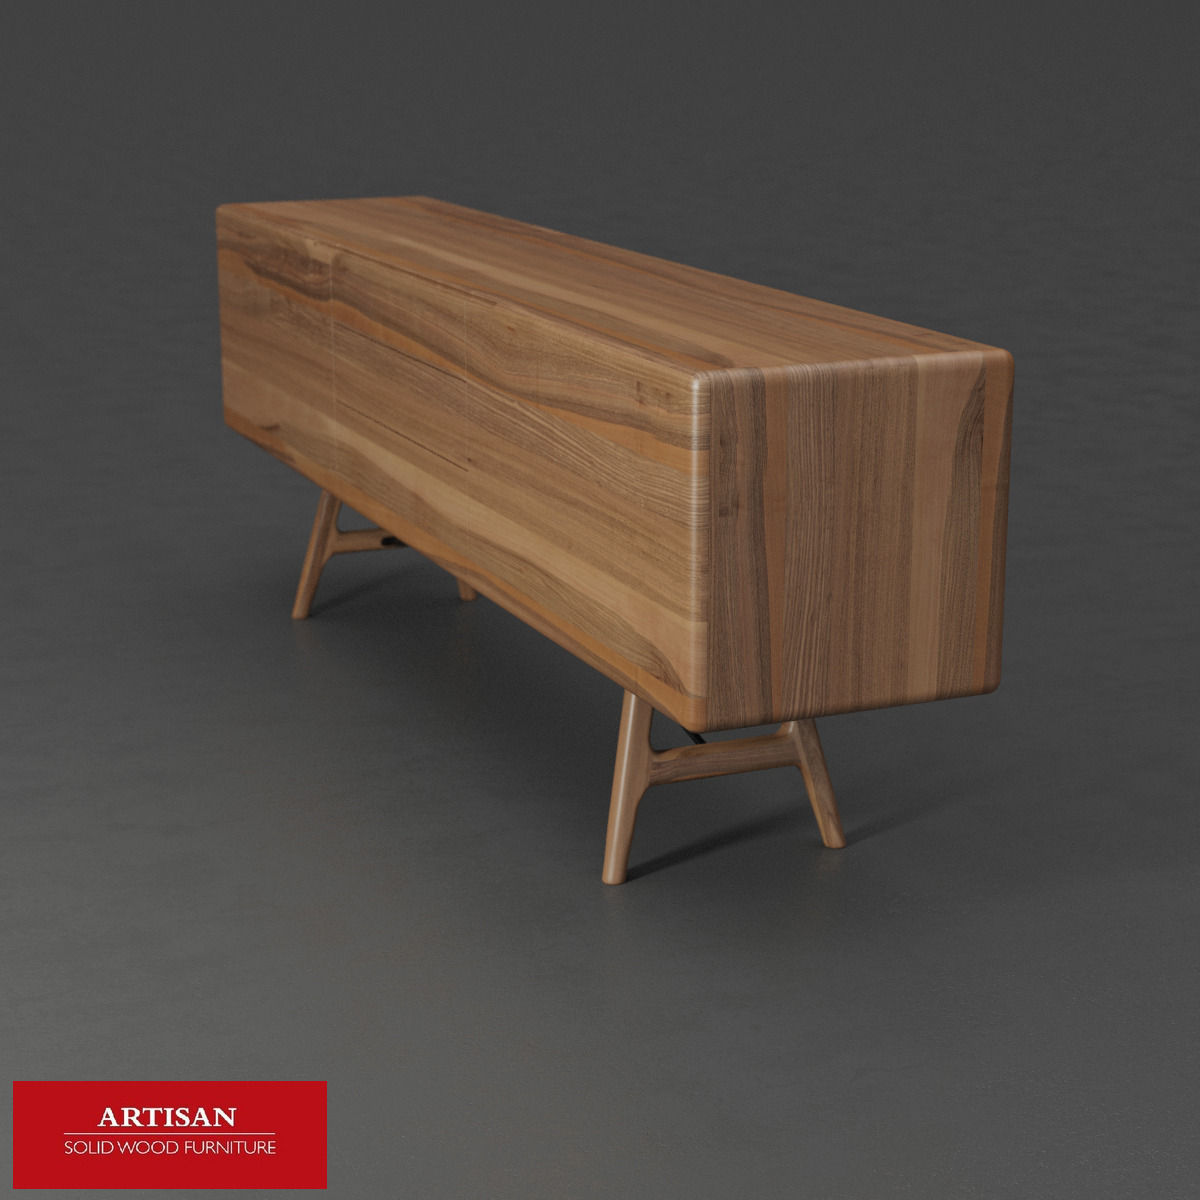 ... Artisan Tesa Sideboard 3d Model Max Obj Mtl 2 ...